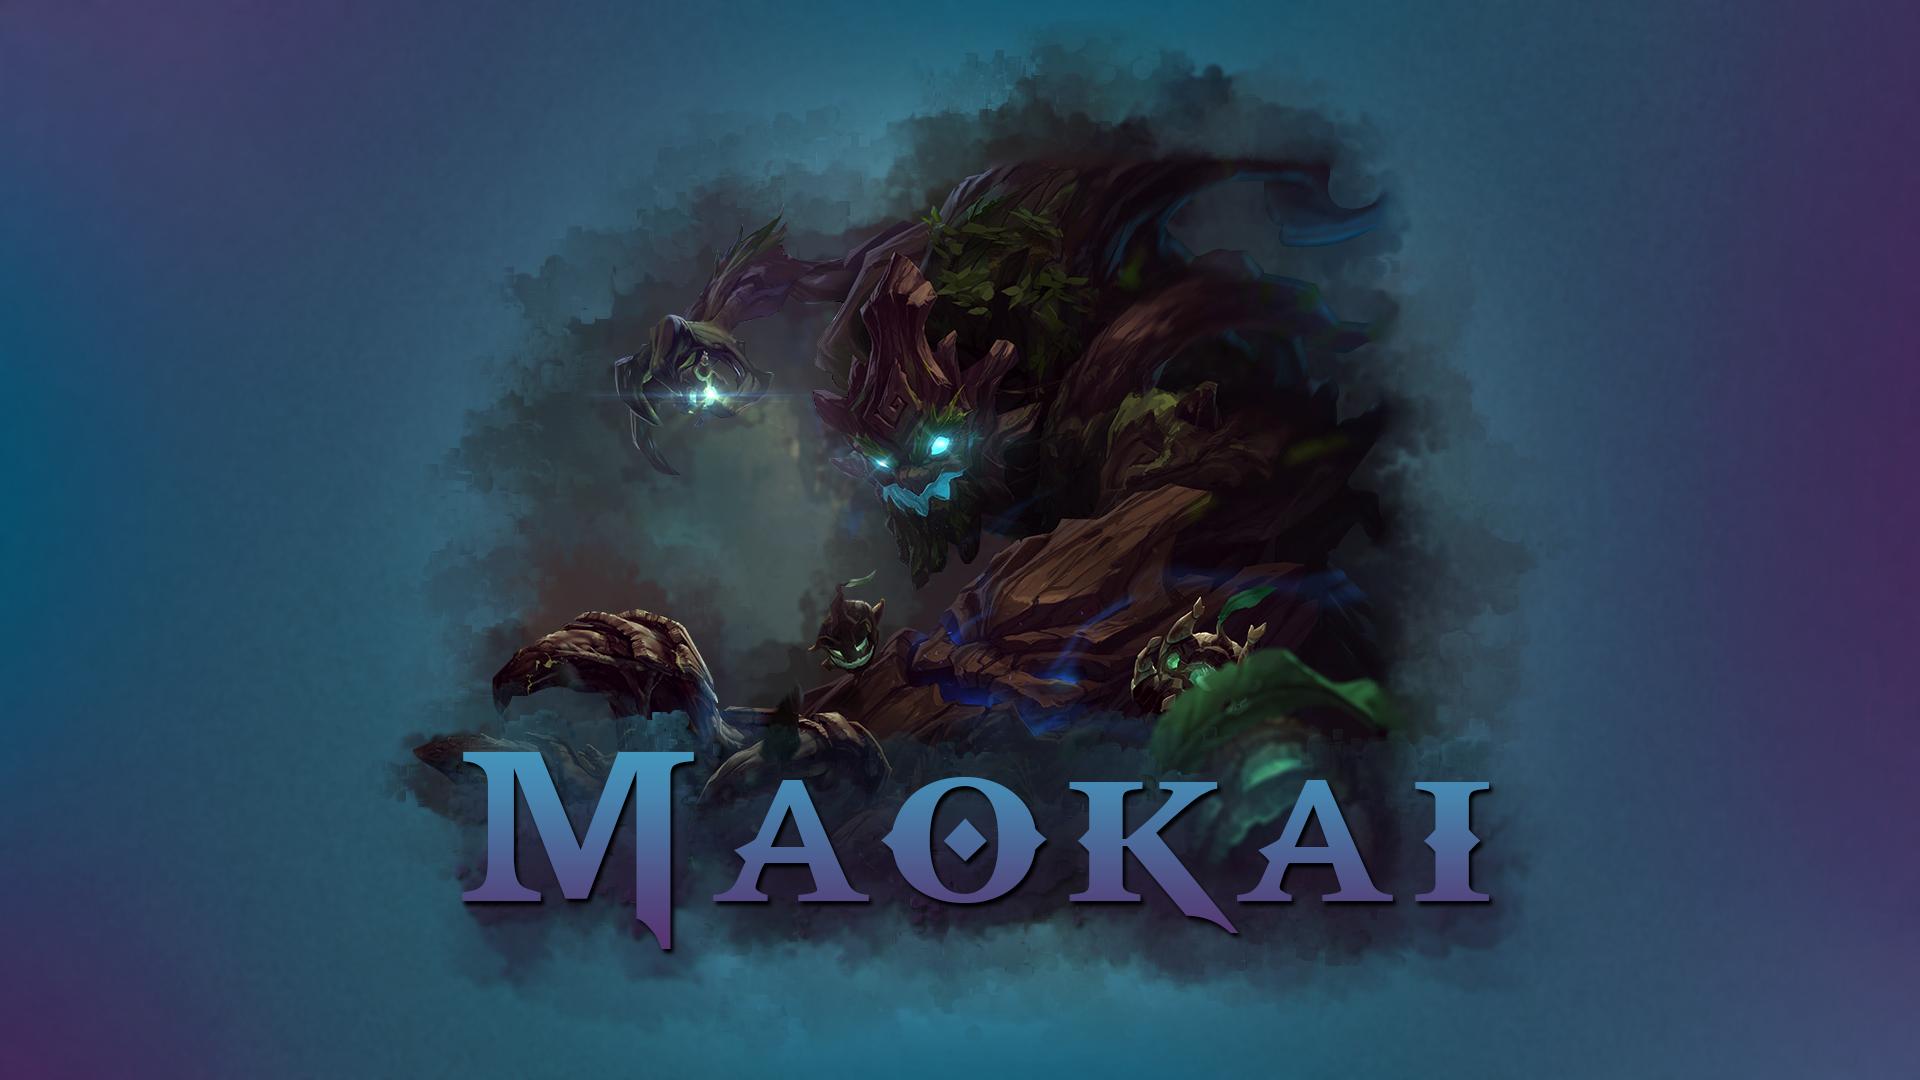 Maokai wallpaper